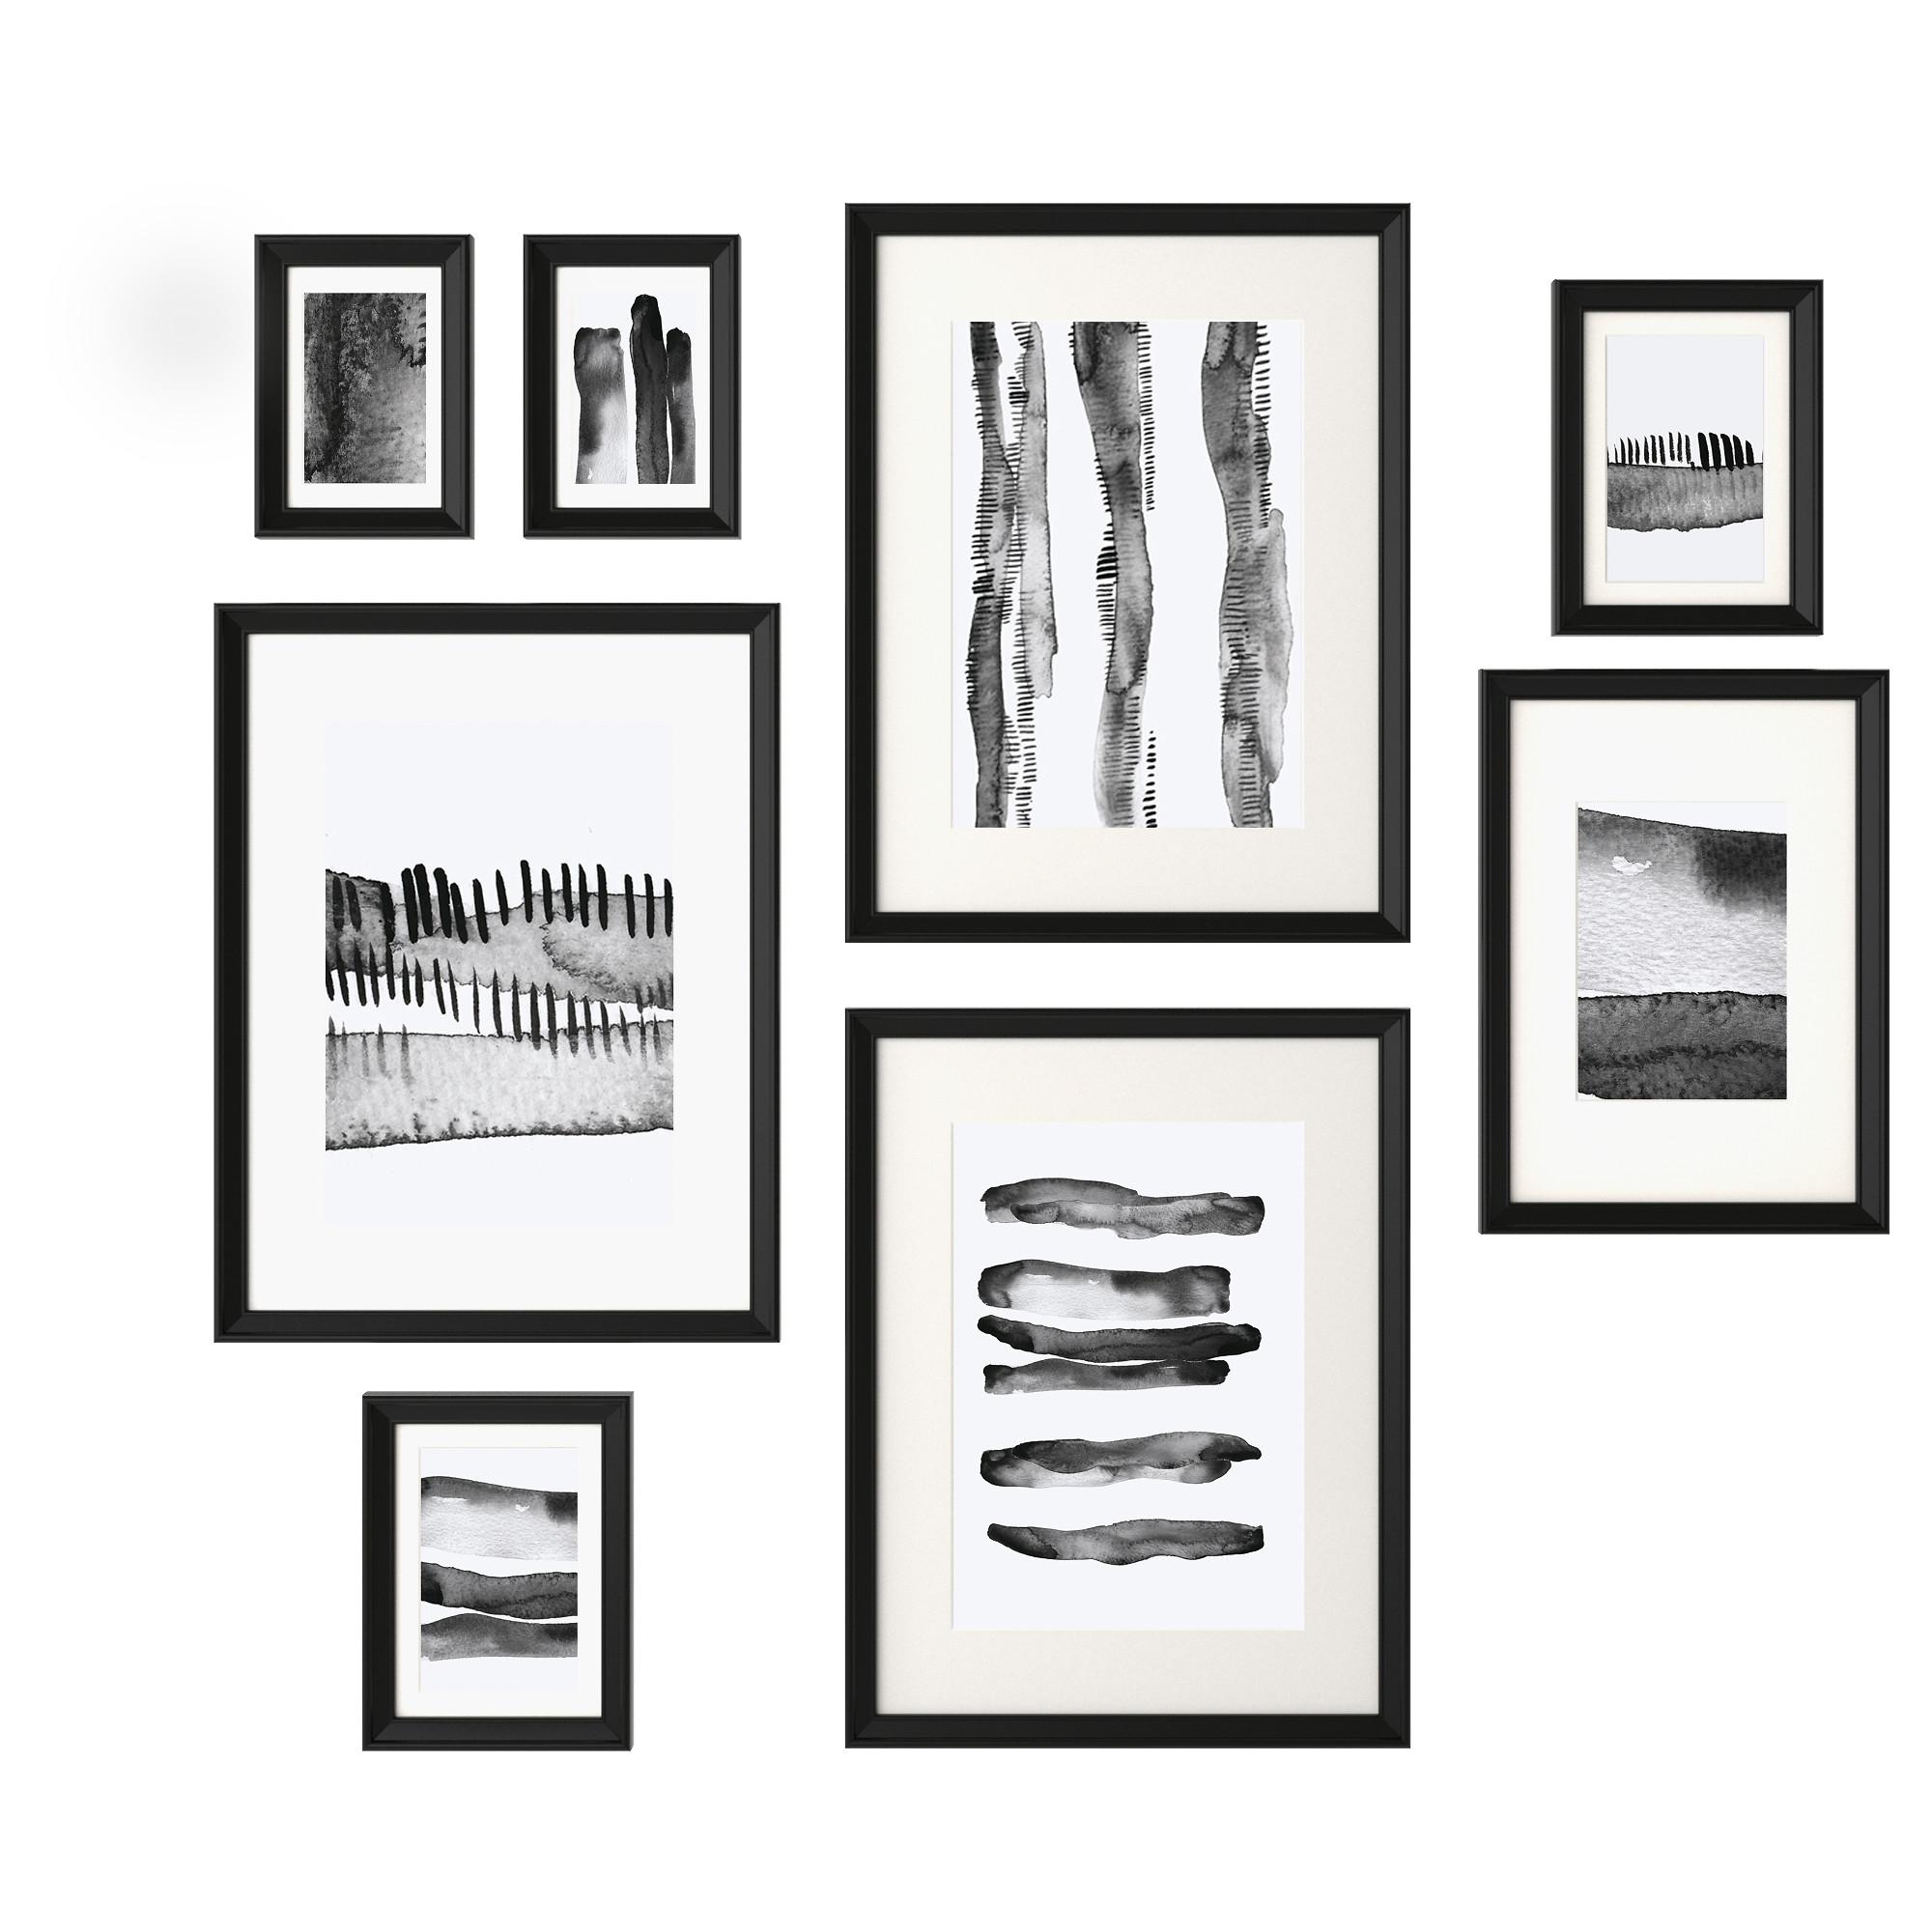 Ikea poster frame 27x40 4068001 - potentiel.info